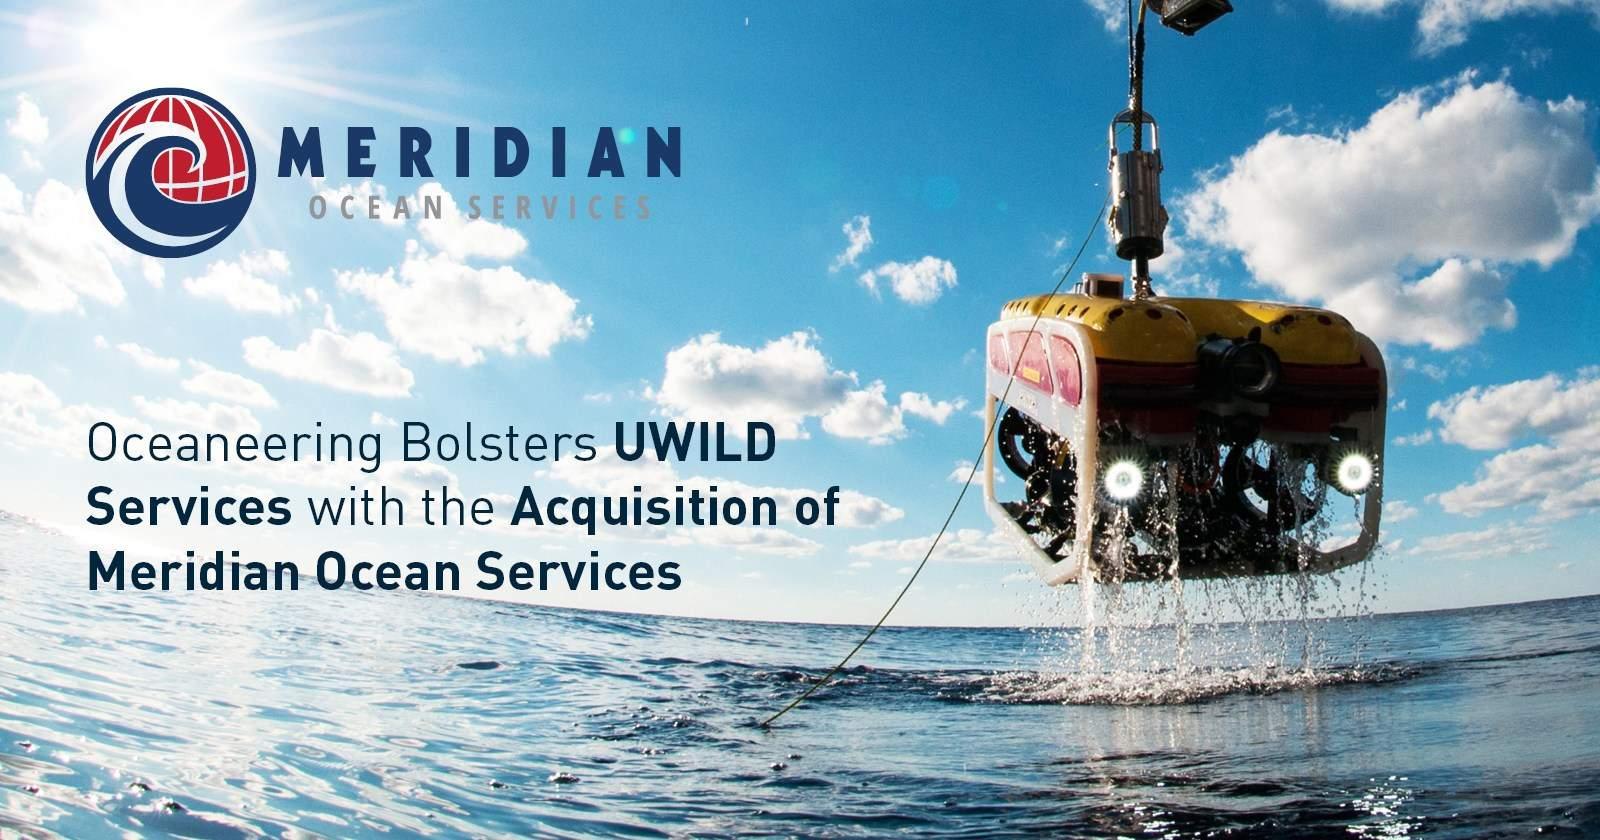 2016 - Oceaneering Acquires Meridian Ocean Services